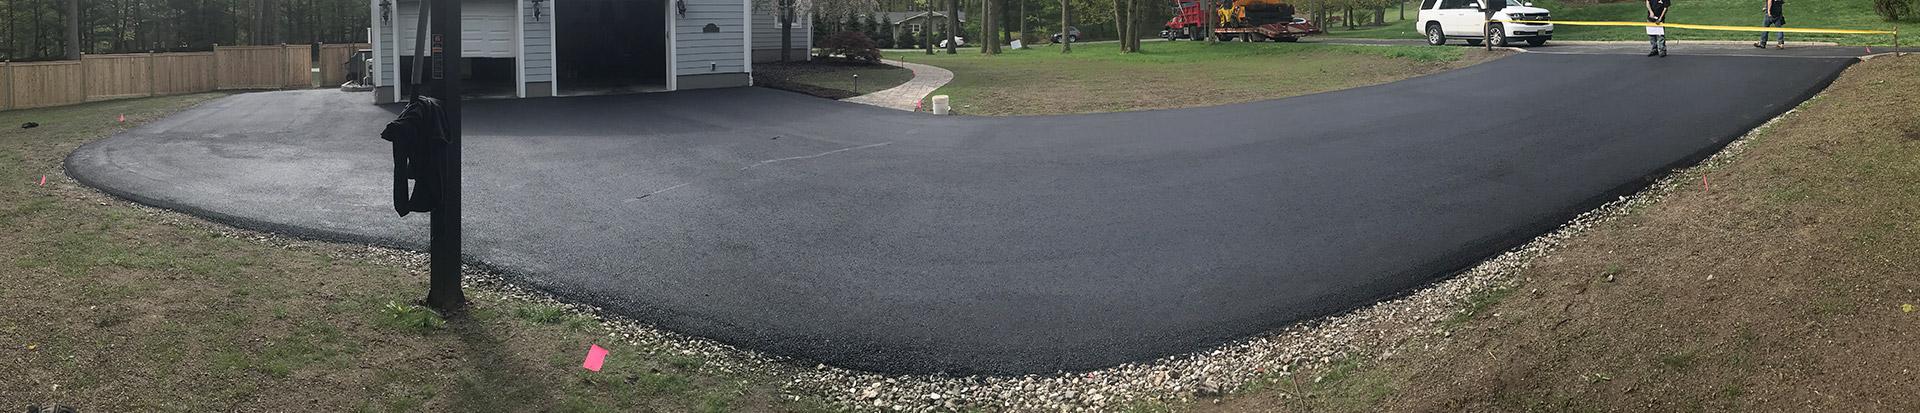 home driveway with fresh asphalt